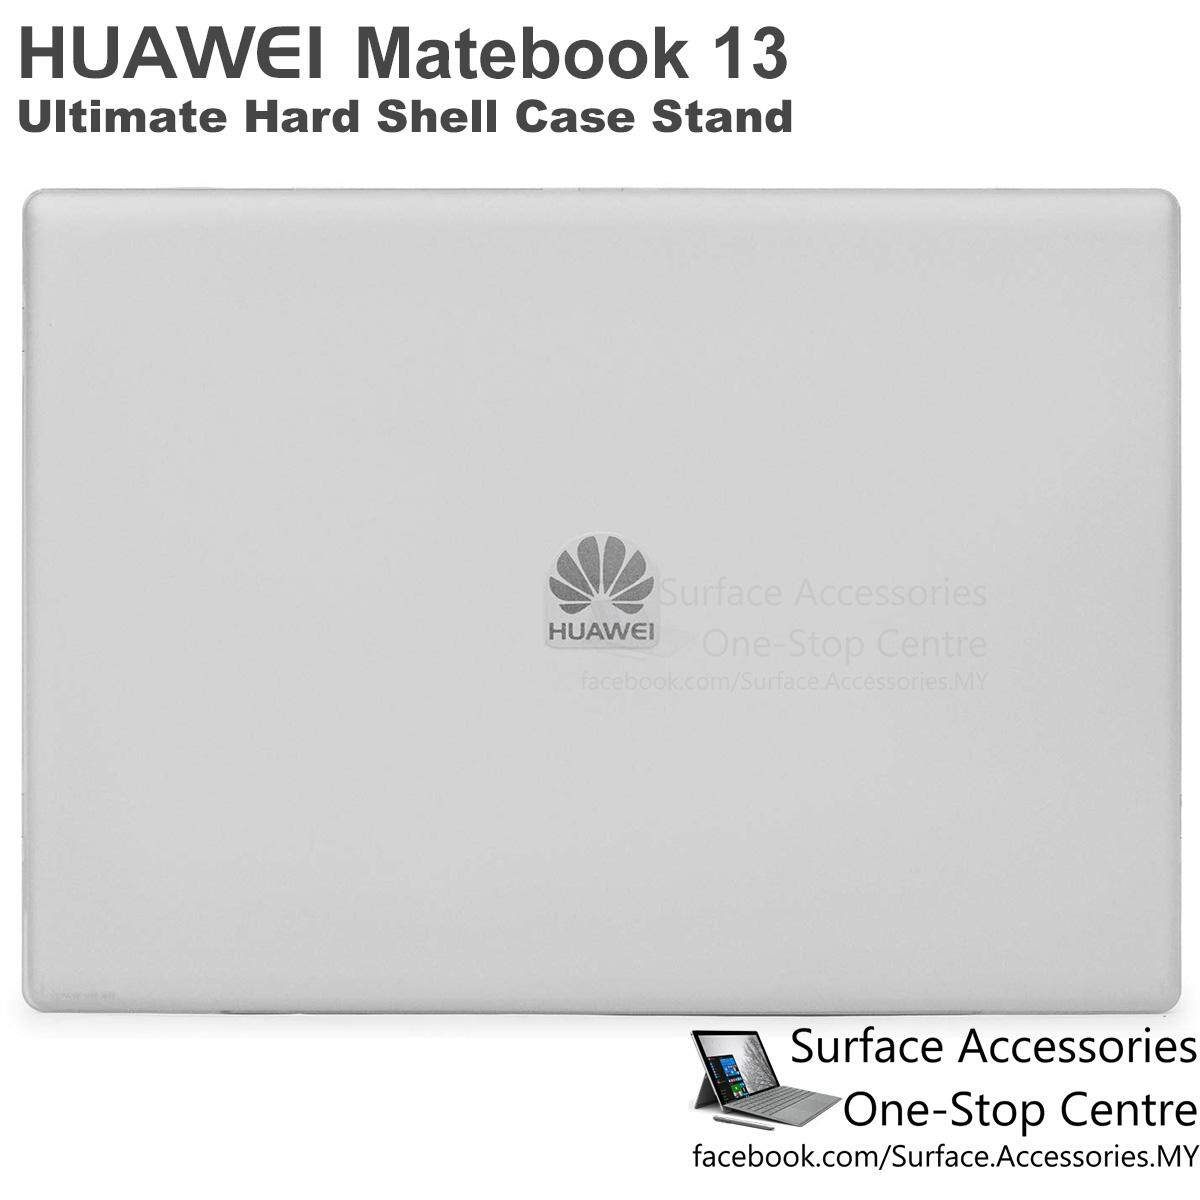 [MALAYSIA]HUAWEI MateBook 13 Ultimate Case Stand Cover HUAWEI MateBook 13 Flip Case HUAWEI MateBook 13 Cover HUAWEI MateBook 13 Stand HUAWEI MateBook 13